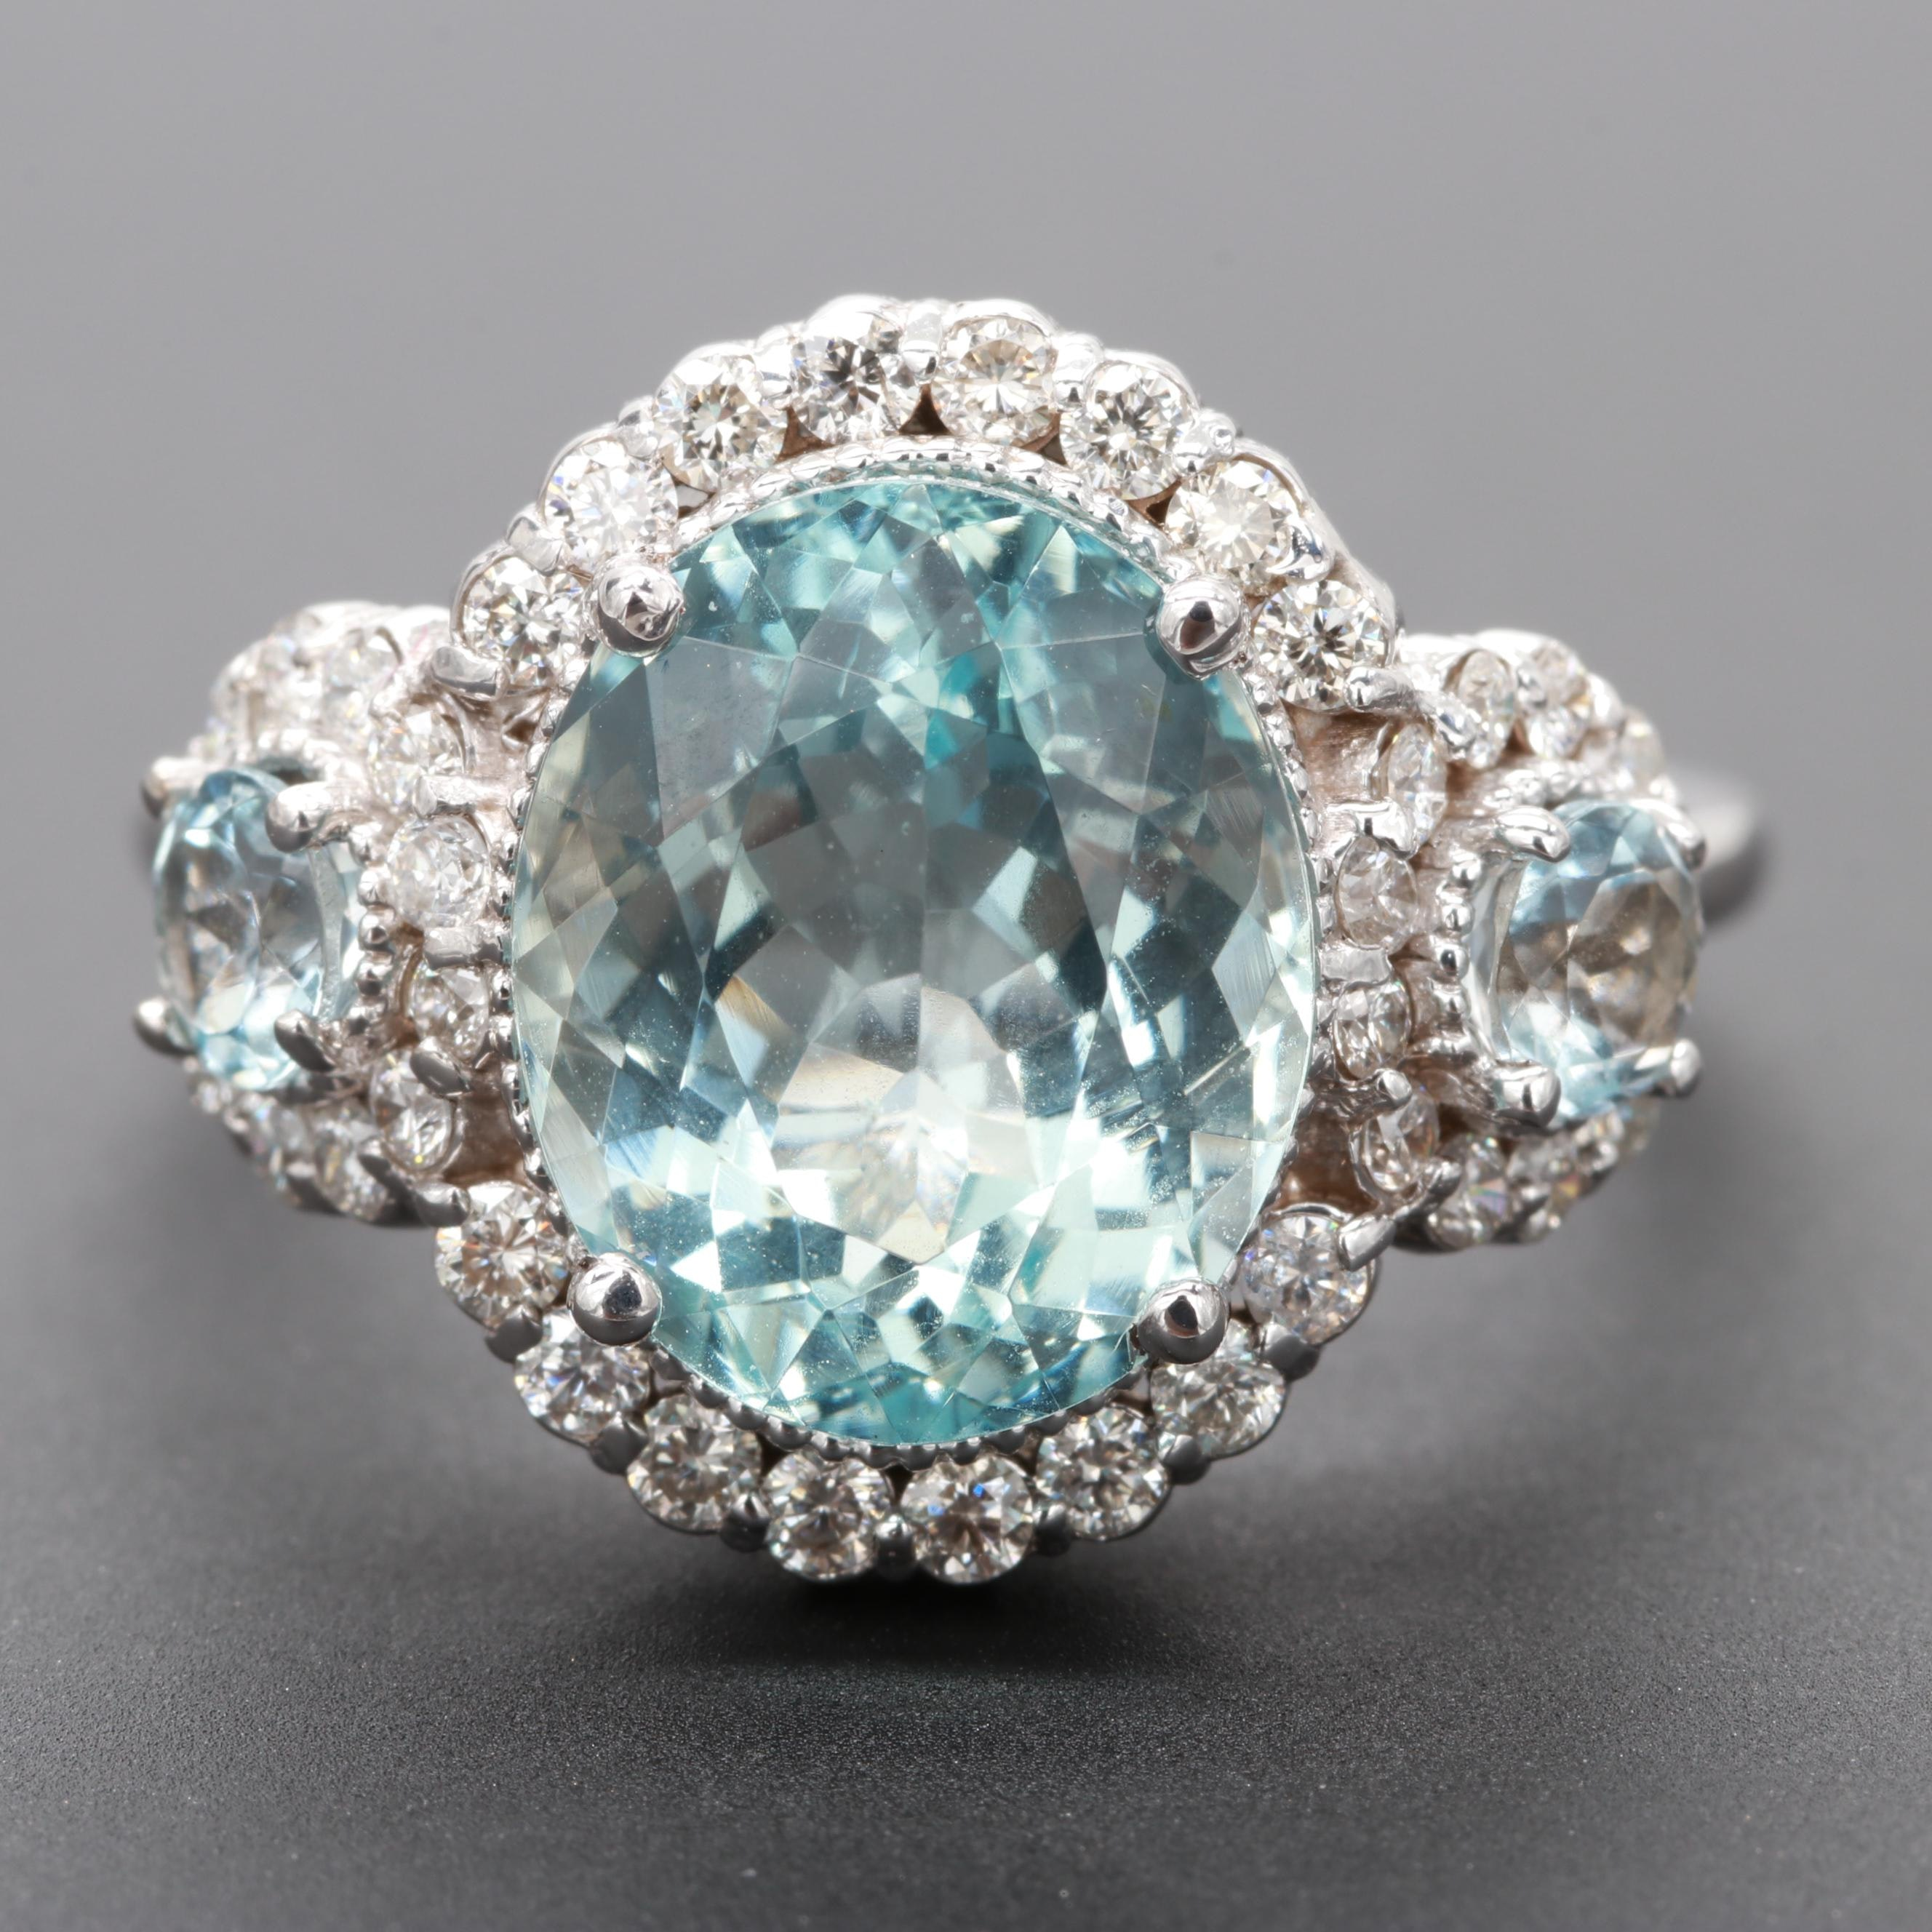 14K White Gold Aquamarine and Diamond Ring with 4.32 CT Center Stone